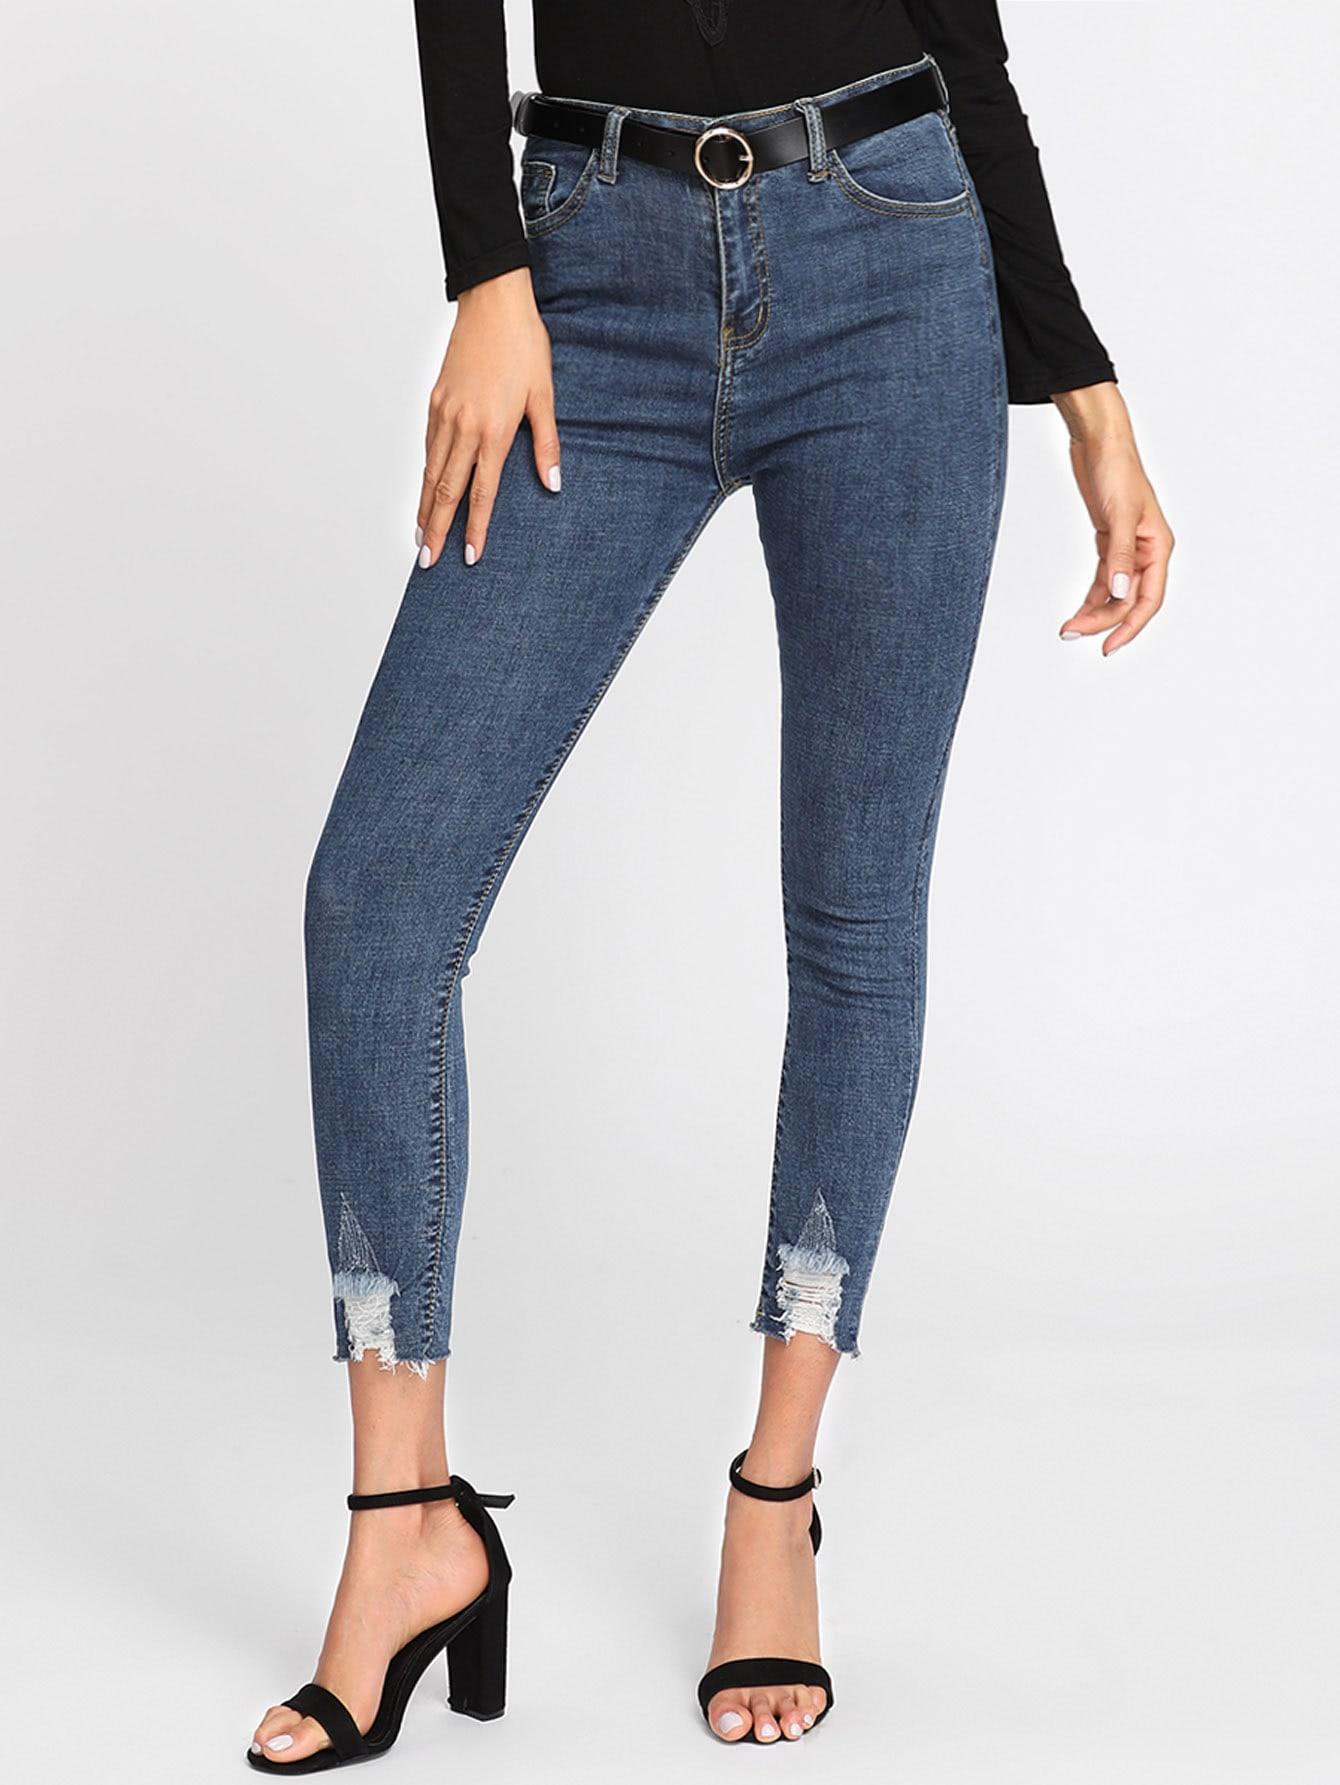 Frayed Hem Skinny Jeans ripped skinny frayed hem jeans